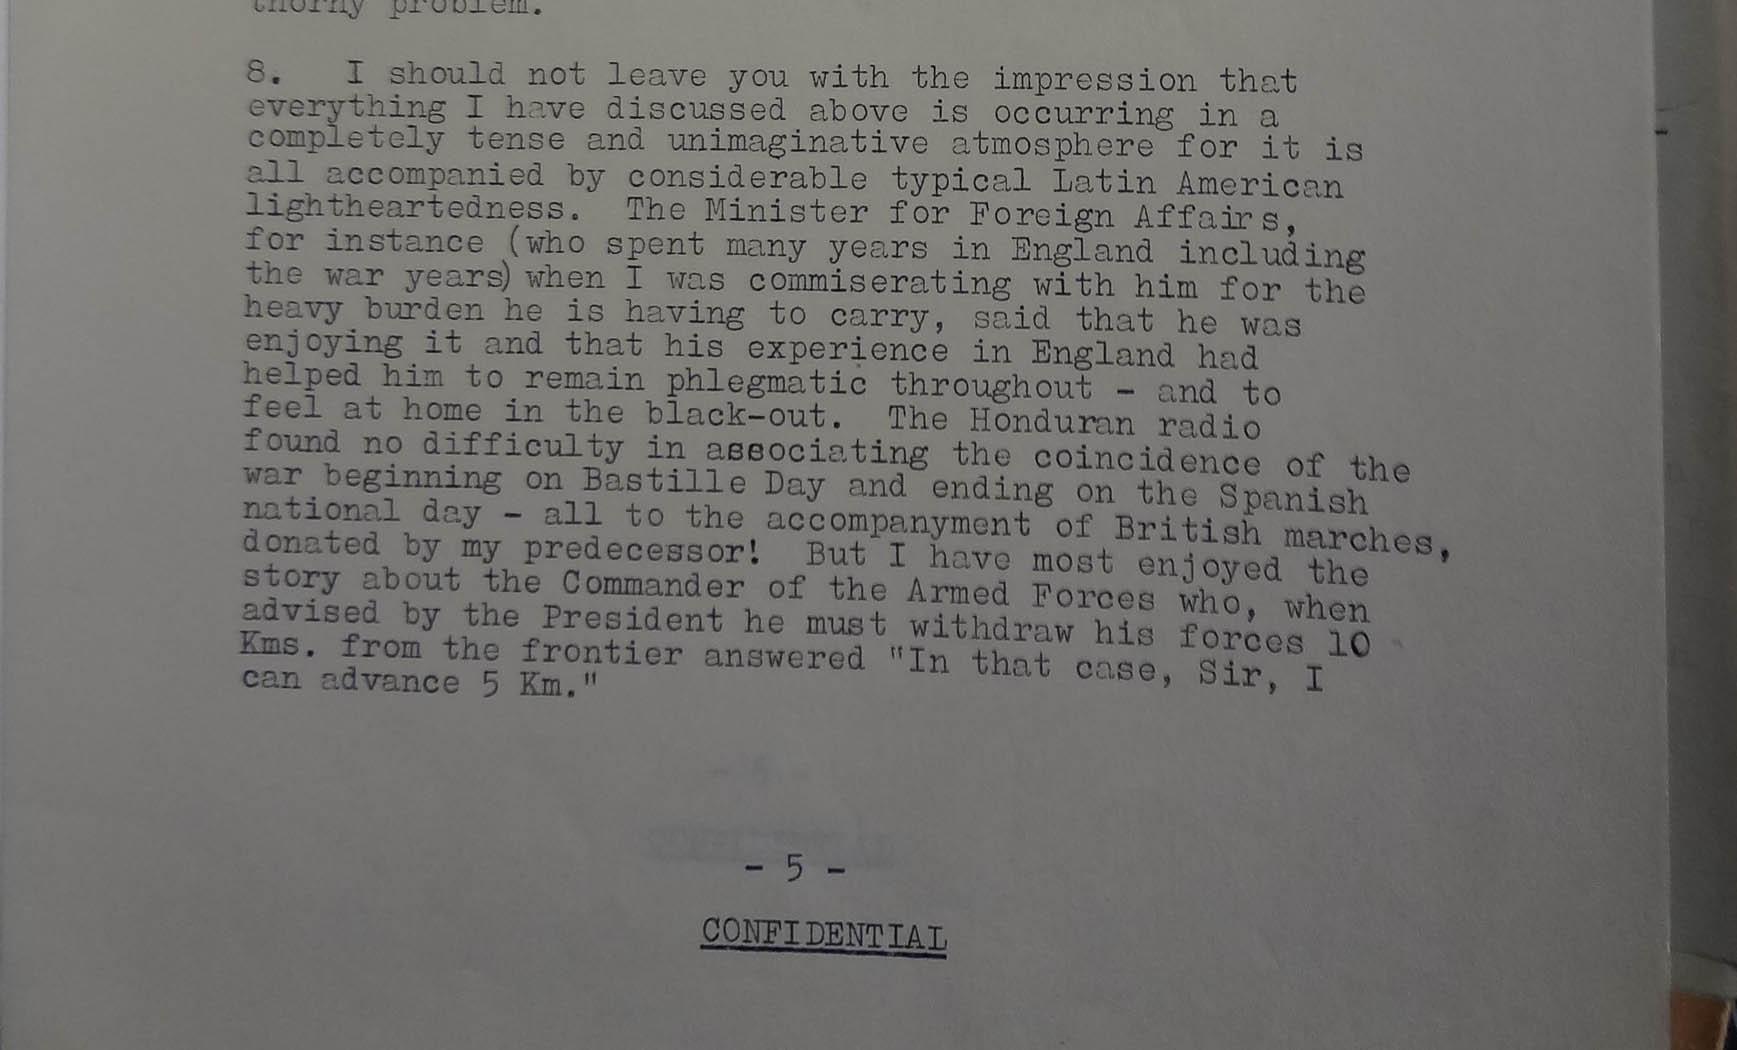 L'Estrange to Wiggin, 23 July 1969 (catalogue reference: FCO 7/1211)